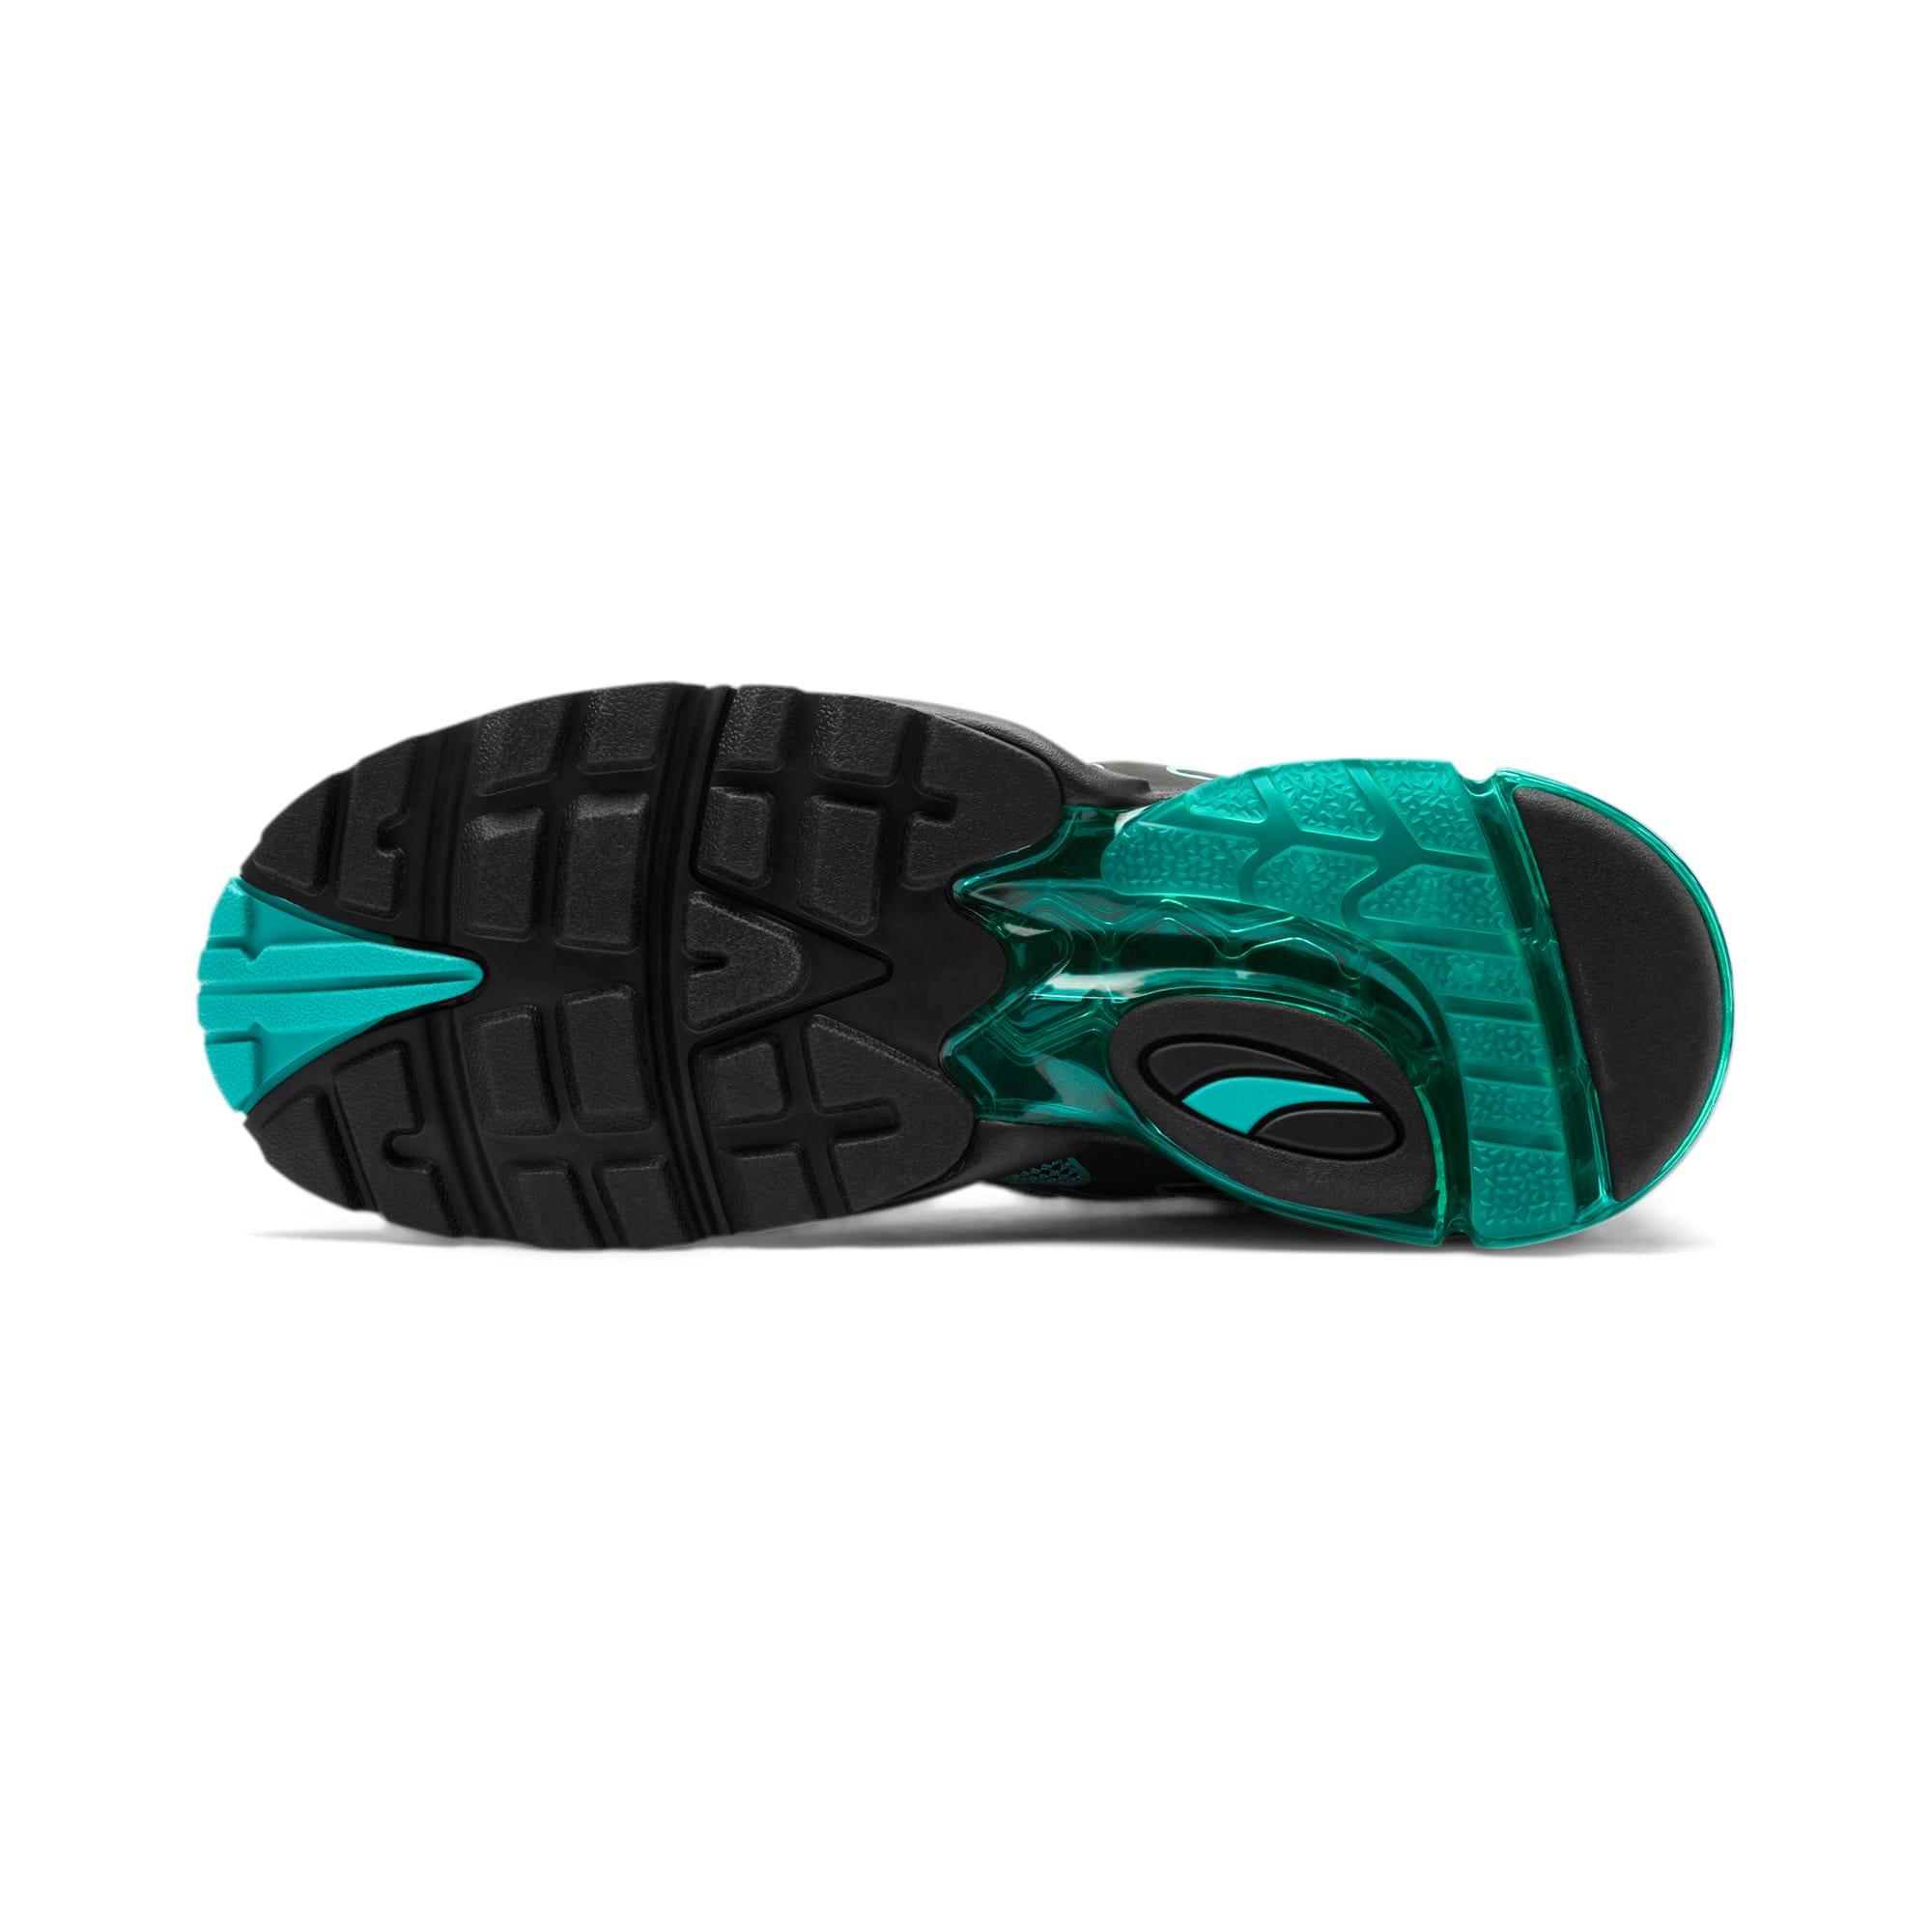 Thumbnail 5 of CELL Alien Kotto Sneakers, Puma Black-Blue Turquoise, medium